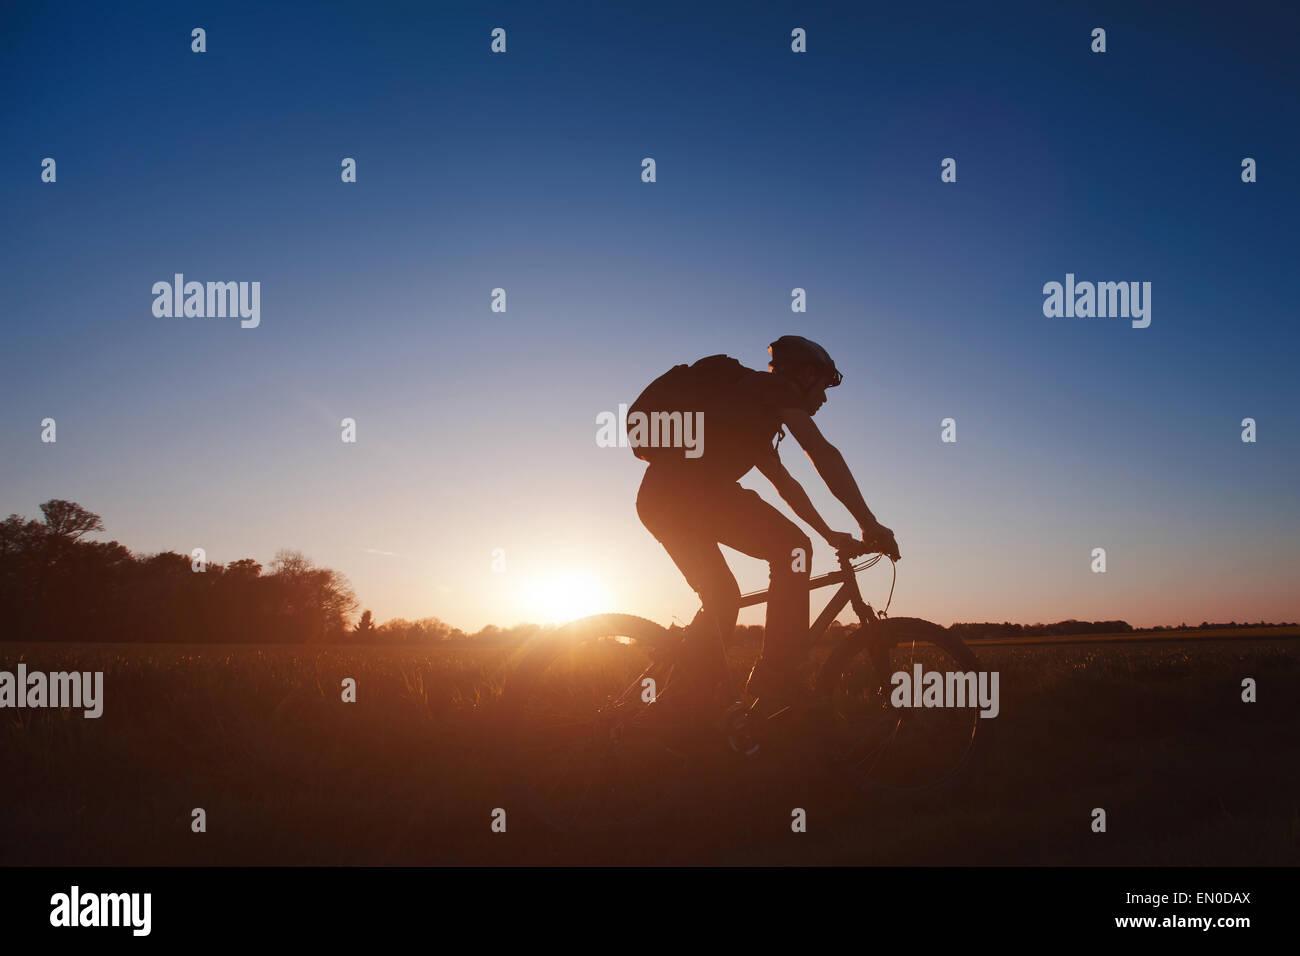 Silueta de joven en la bicicleta al atardecer Imagen De Stock